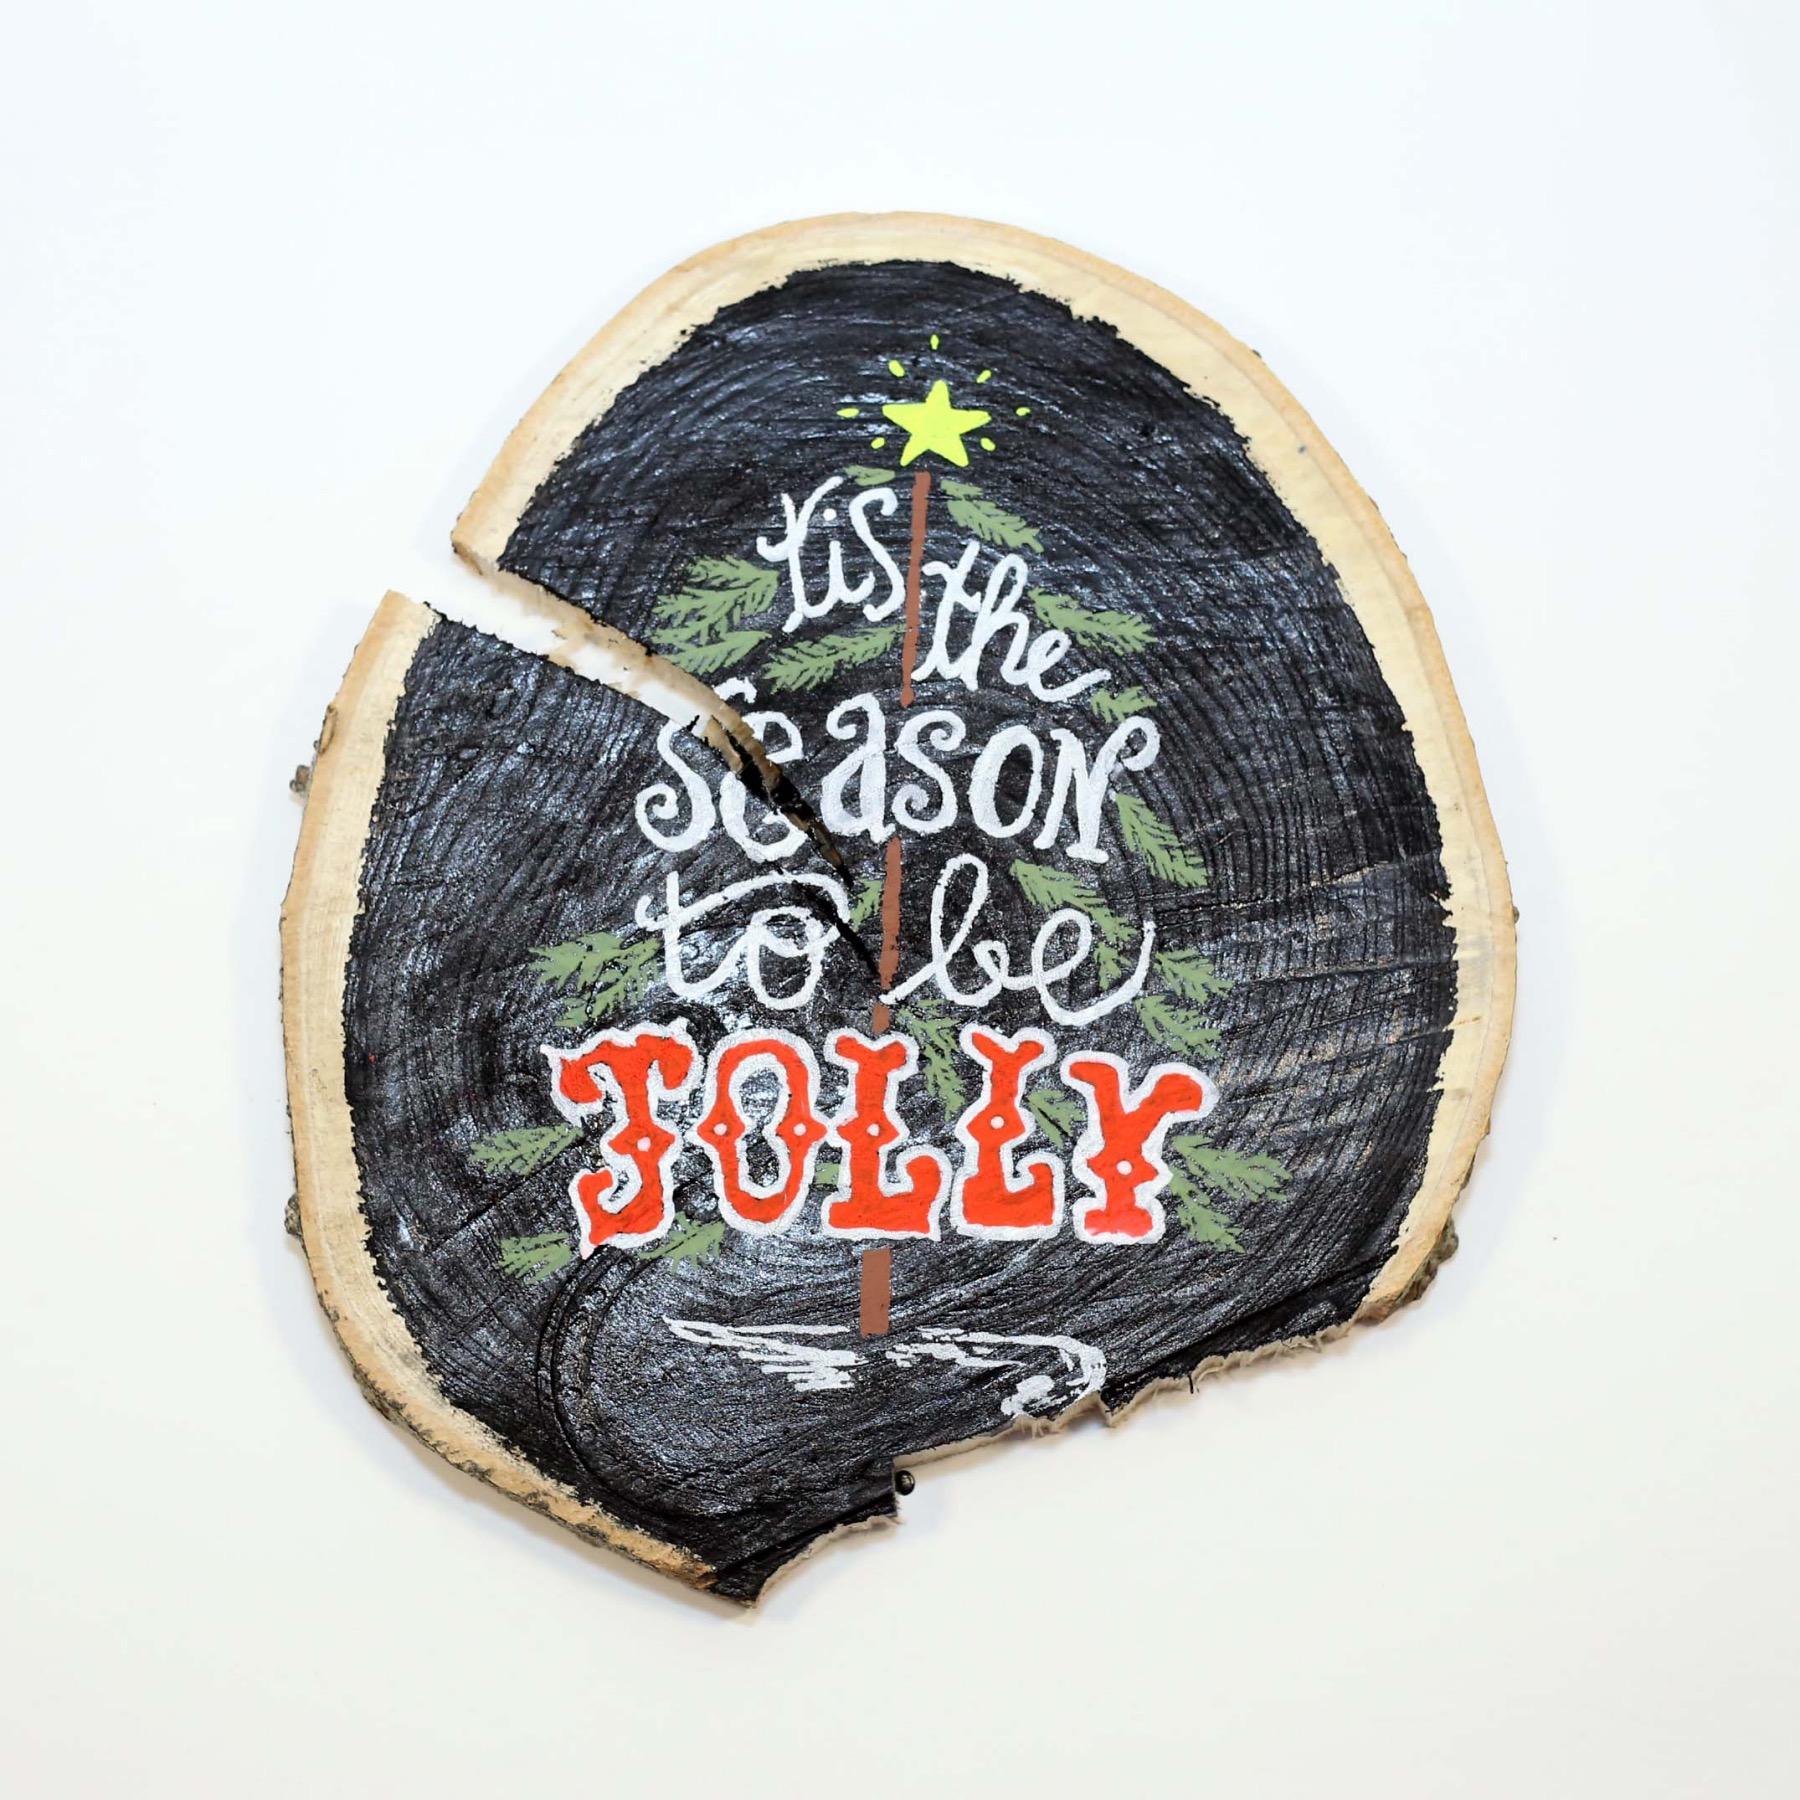 tis the season to be jolly chalkboard sign diy